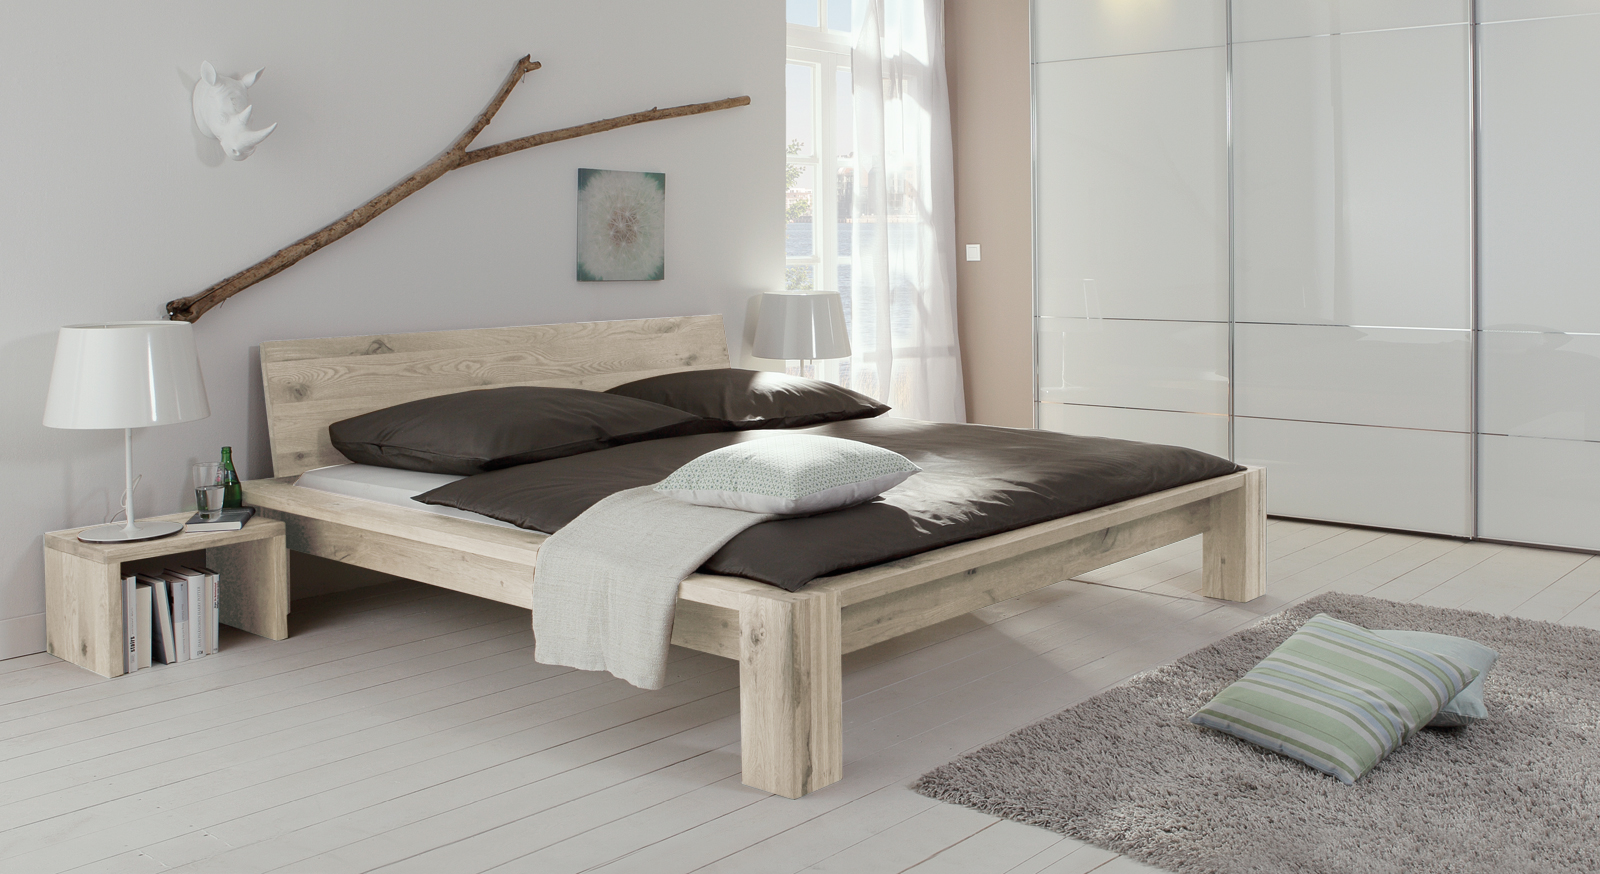 rustikales wildeiche bett massiv gebaut perugia. Black Bedroom Furniture Sets. Home Design Ideas